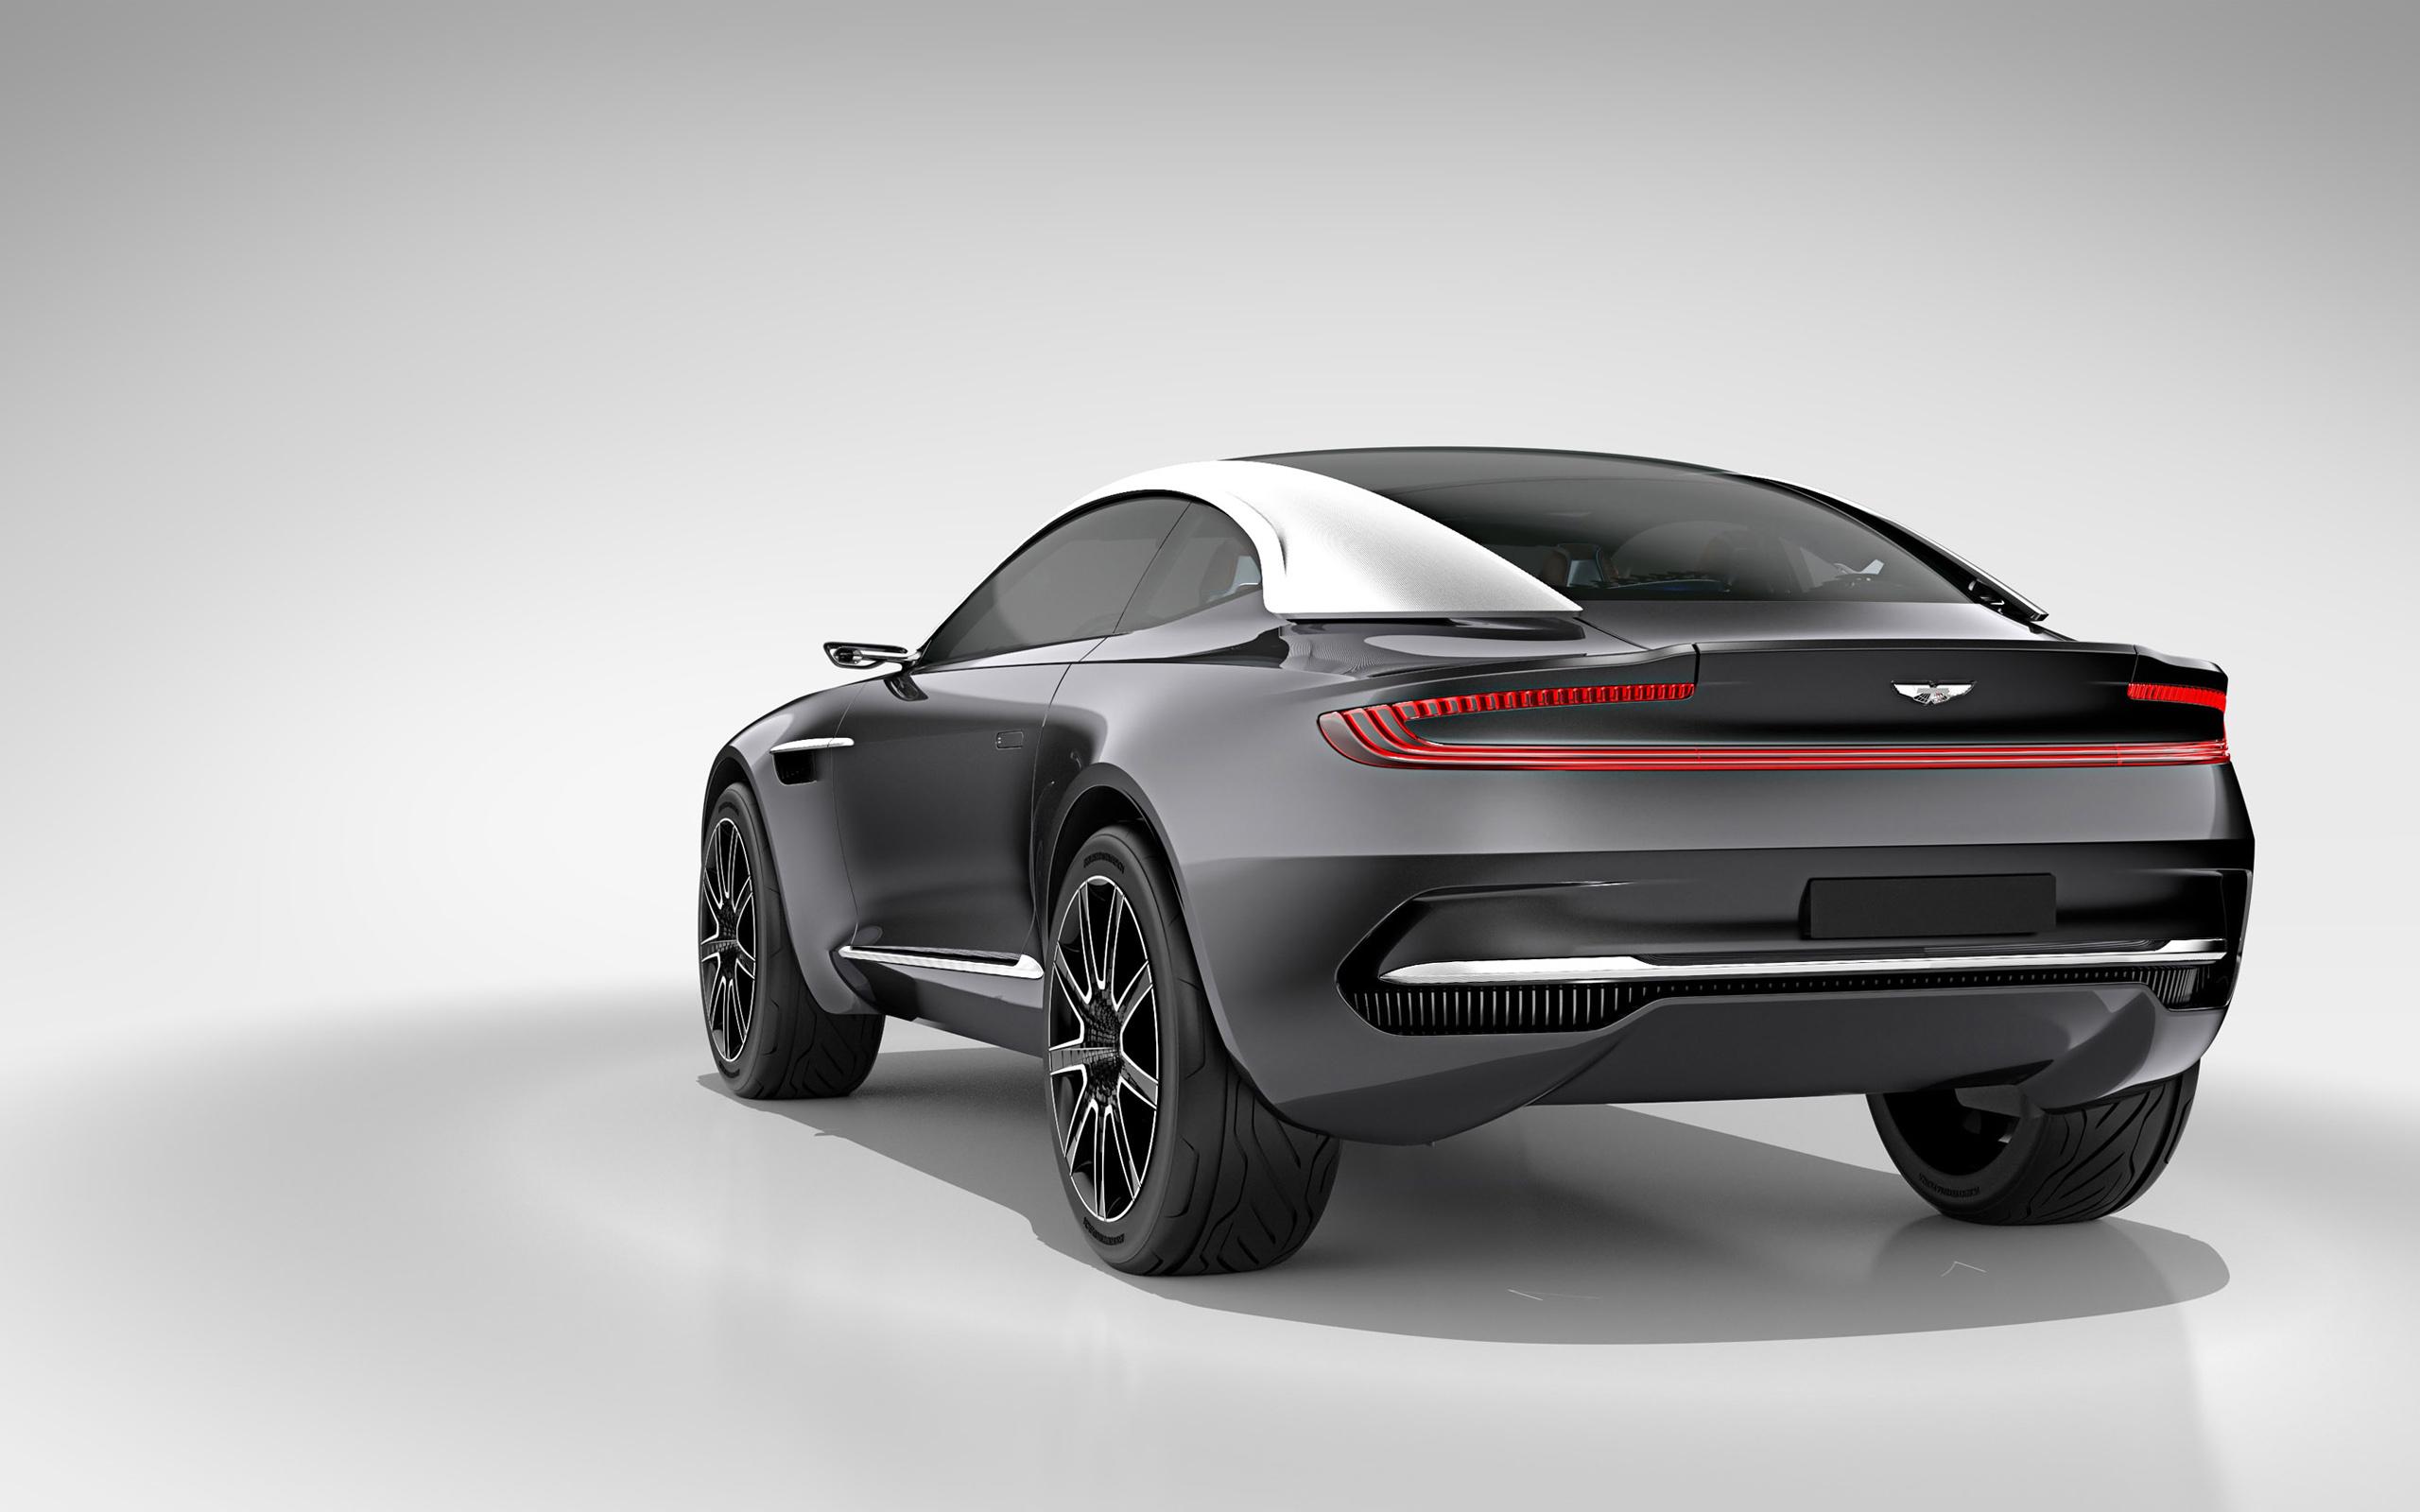 2015 Aston Martin Dbx Concept 2 Wallpaper Hd Car Wallpapers Id 5191